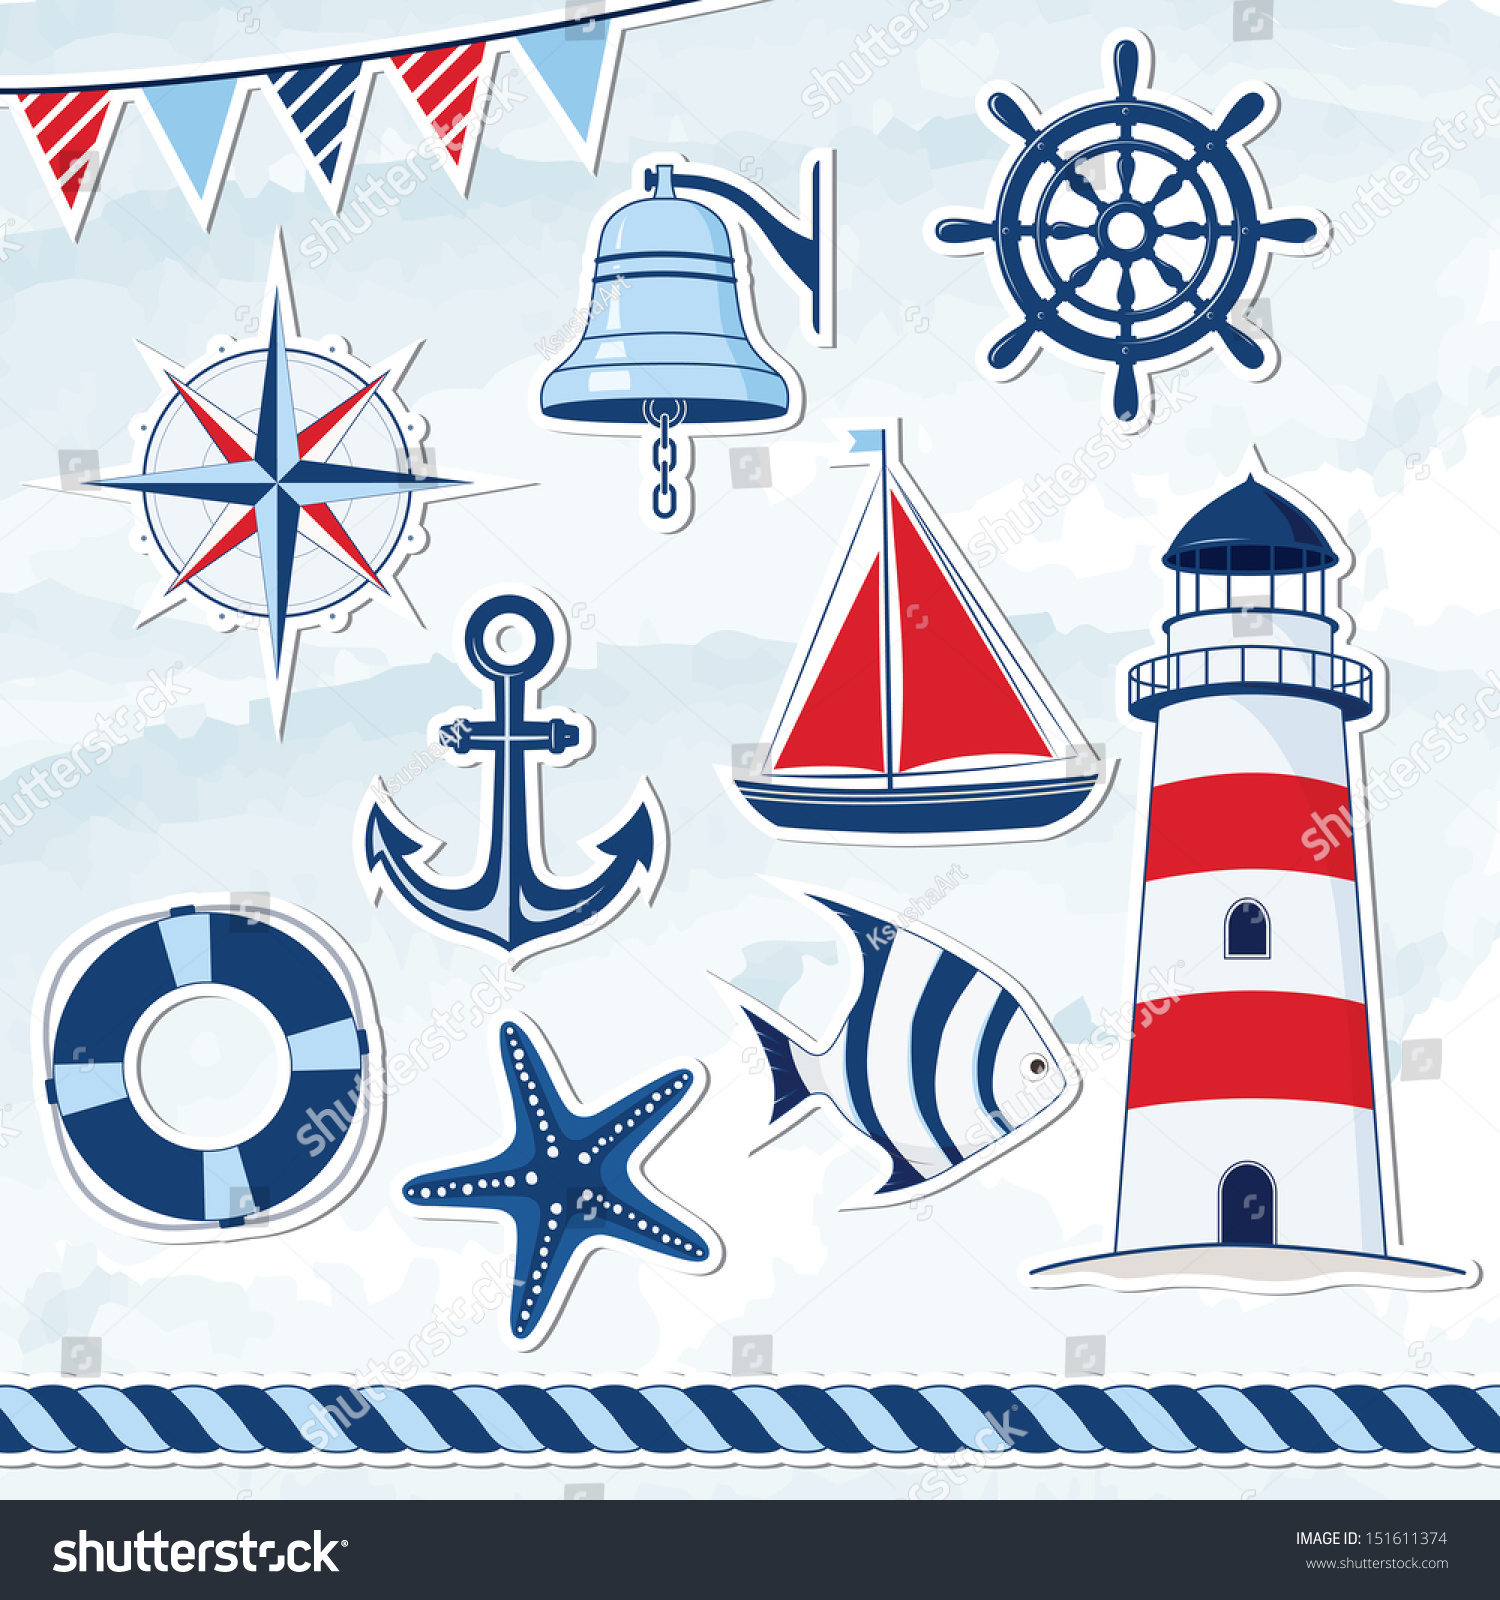 Key Elements Of Nautical Style: Nautical Design Elements Anchor Starfish Wheel Stock